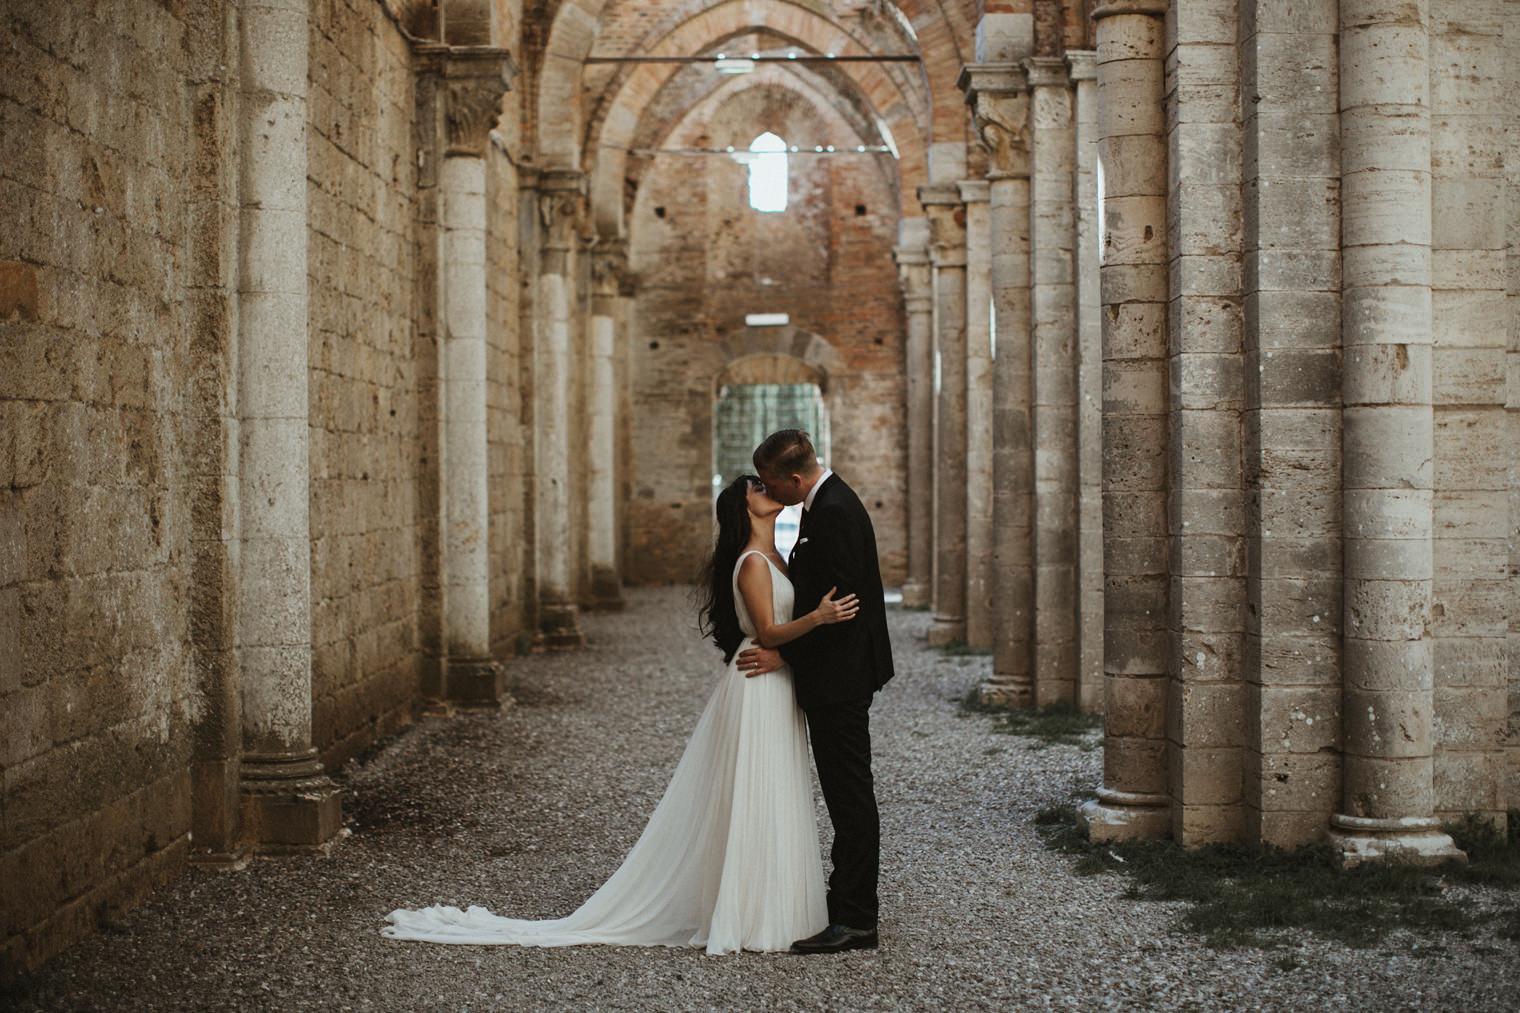 Tuscany wedding venue